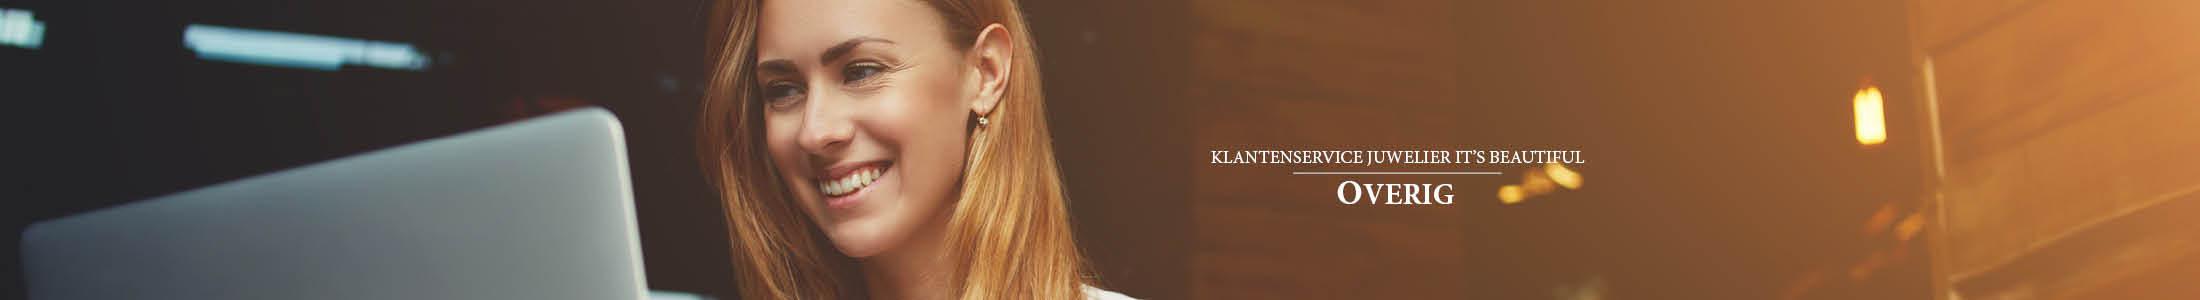 Klantenservice Juwelier It's Beautiful - Overig